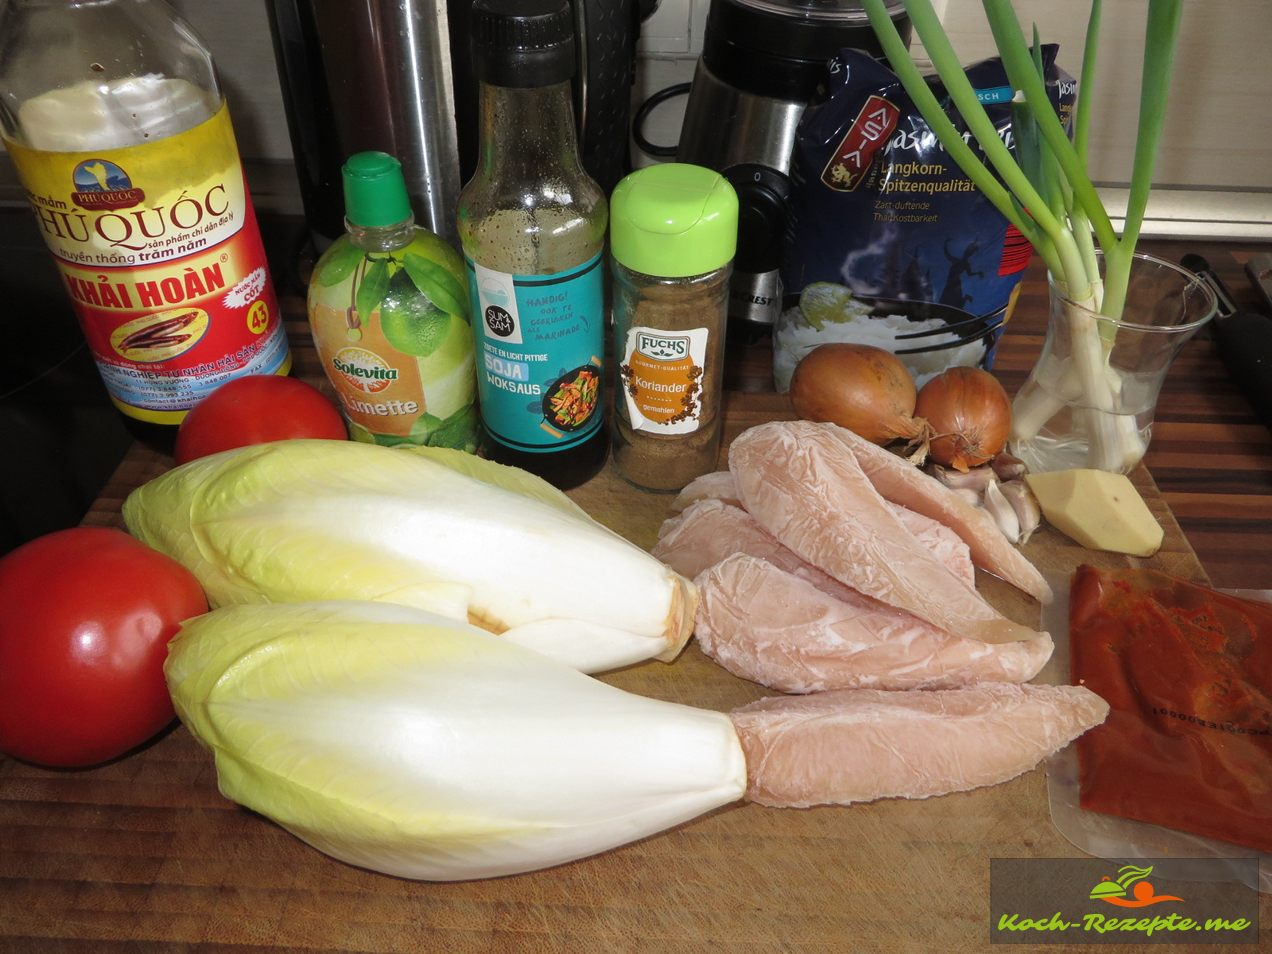 Zutaten: Chicoree,Ingwer,Zwiebeln,Hähnchenfilet,Frühlingszwiebeln,Tomaten, Kokosöl,Koriander , Fertige Teriyaki Honig Sauce.